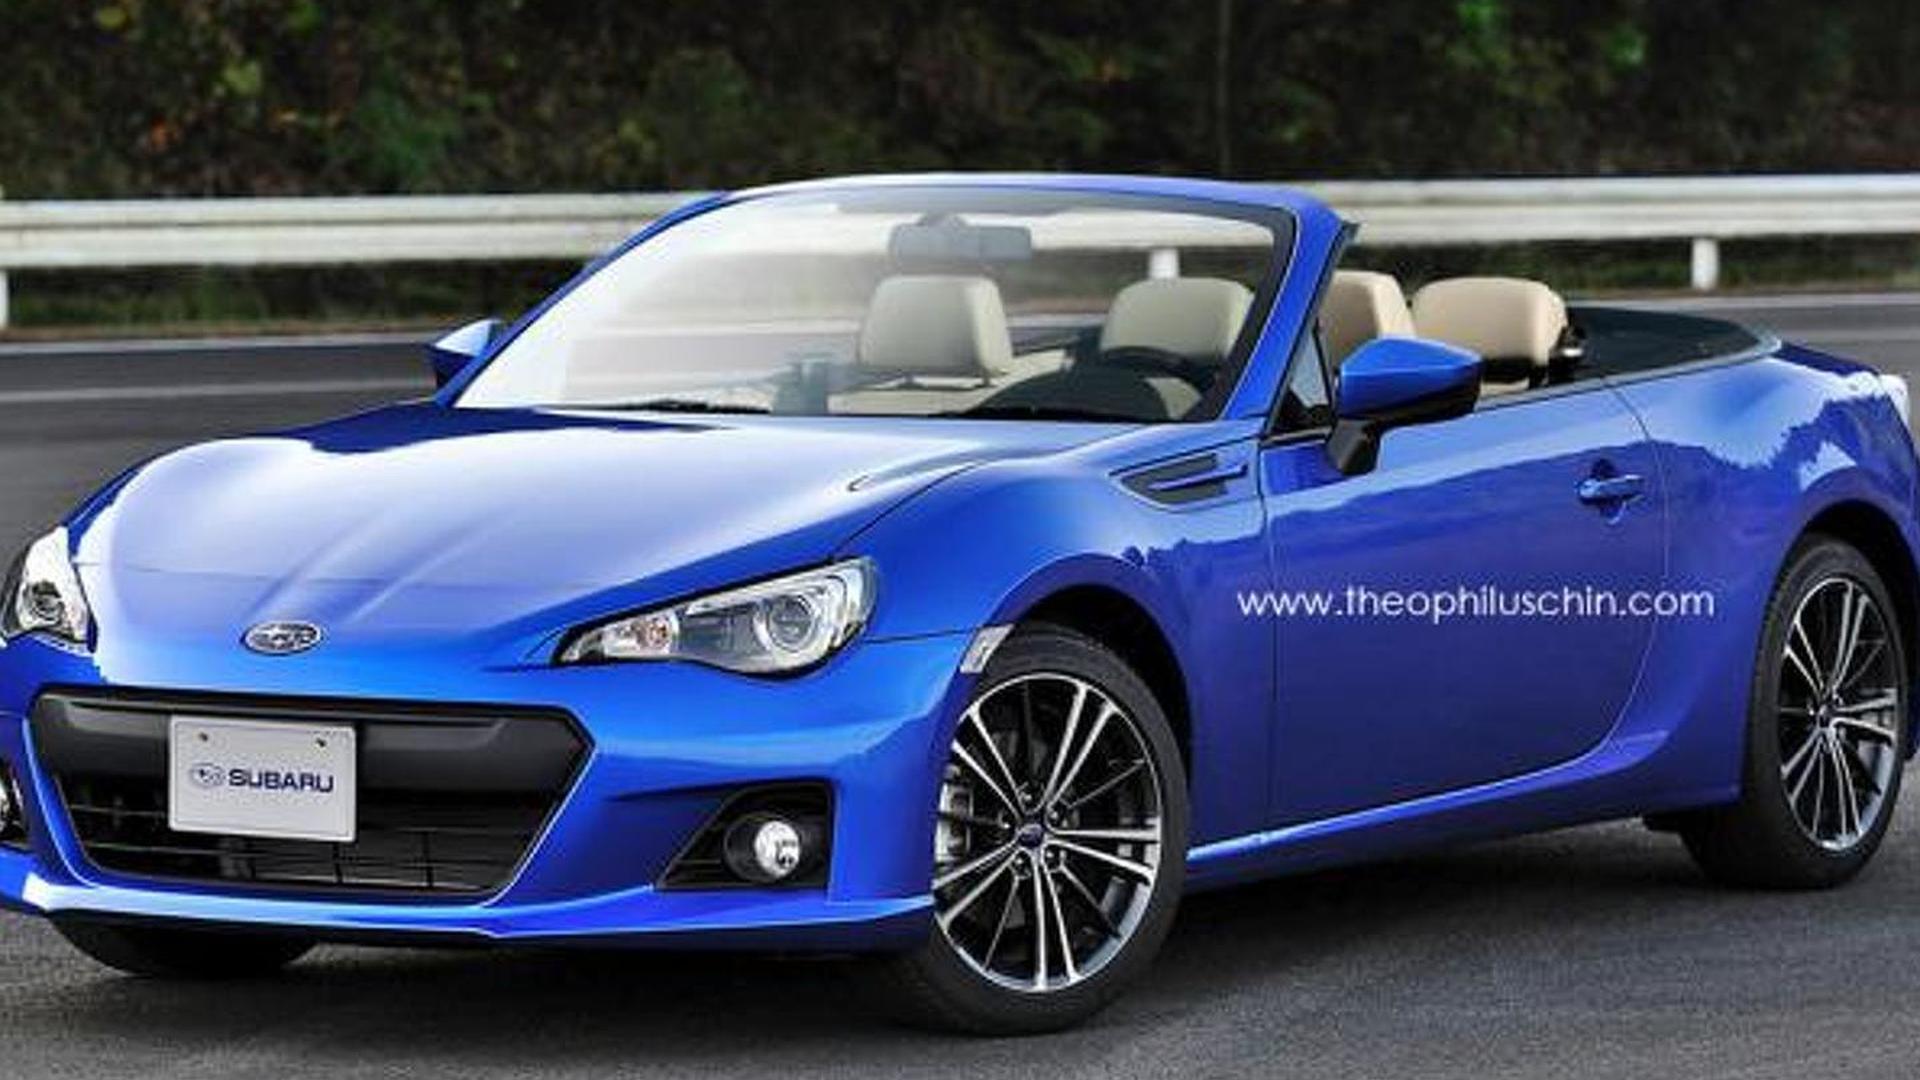 2013 Subaru Brz >> Subaru confirms AWD Twin-Turbo Convertible two-seater Diesel Hybrid BRZ